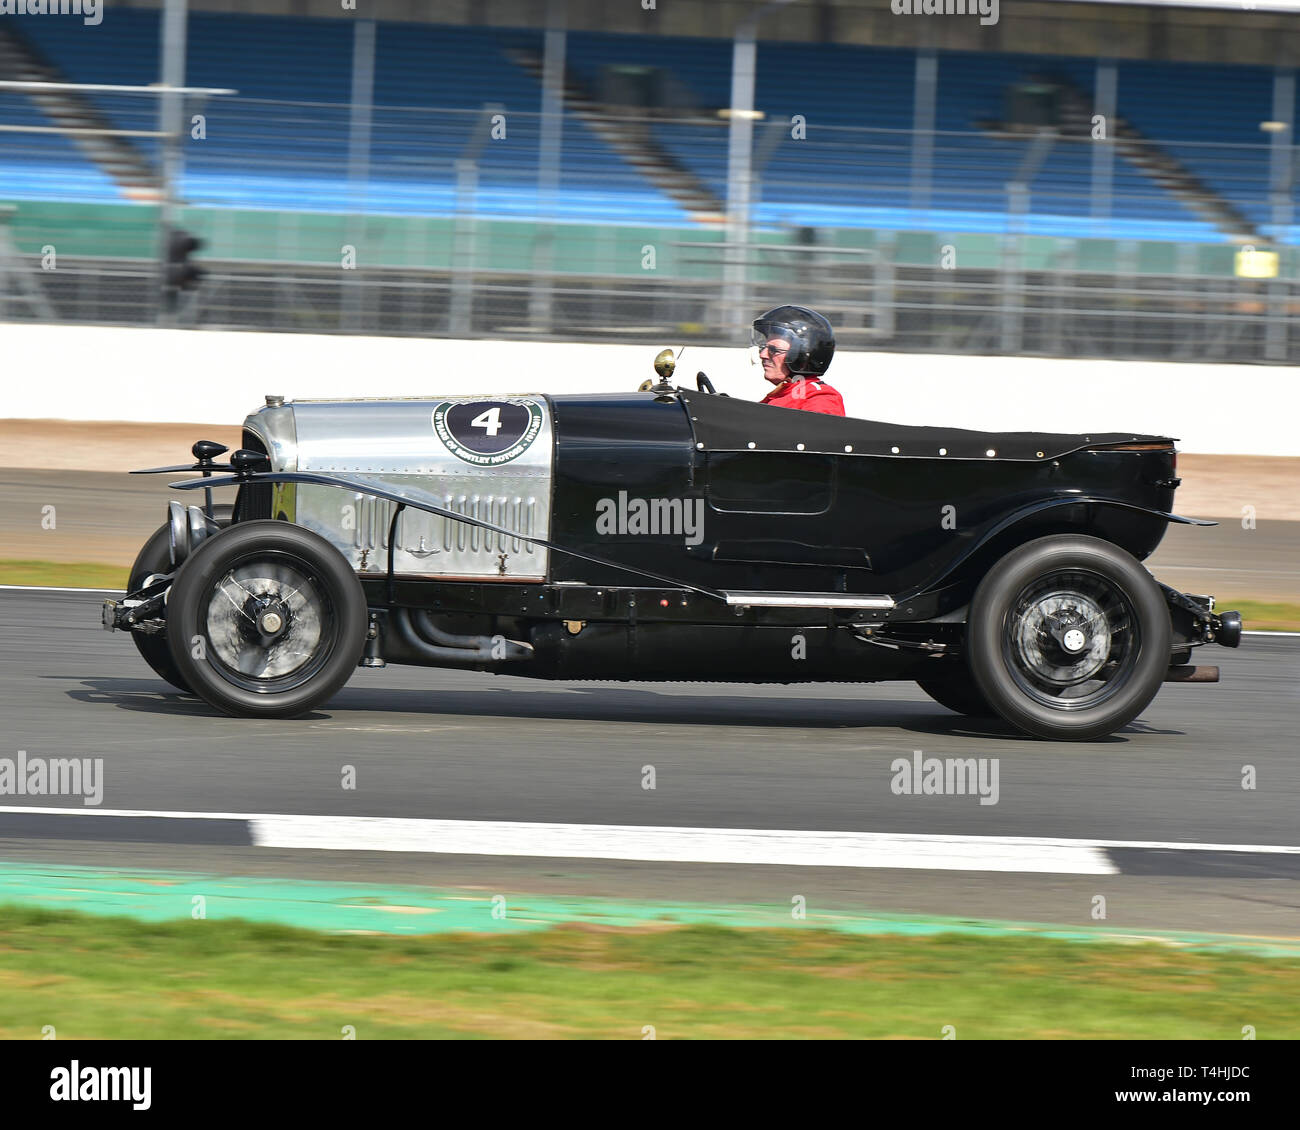 William Elbourn Jnr, Bentley 3-4½ litre Light Tourer, Benjafield 100, 100 Years of Bentley, April 2019,  Silverstone, Northamptonshire, England, circu - Stock Image